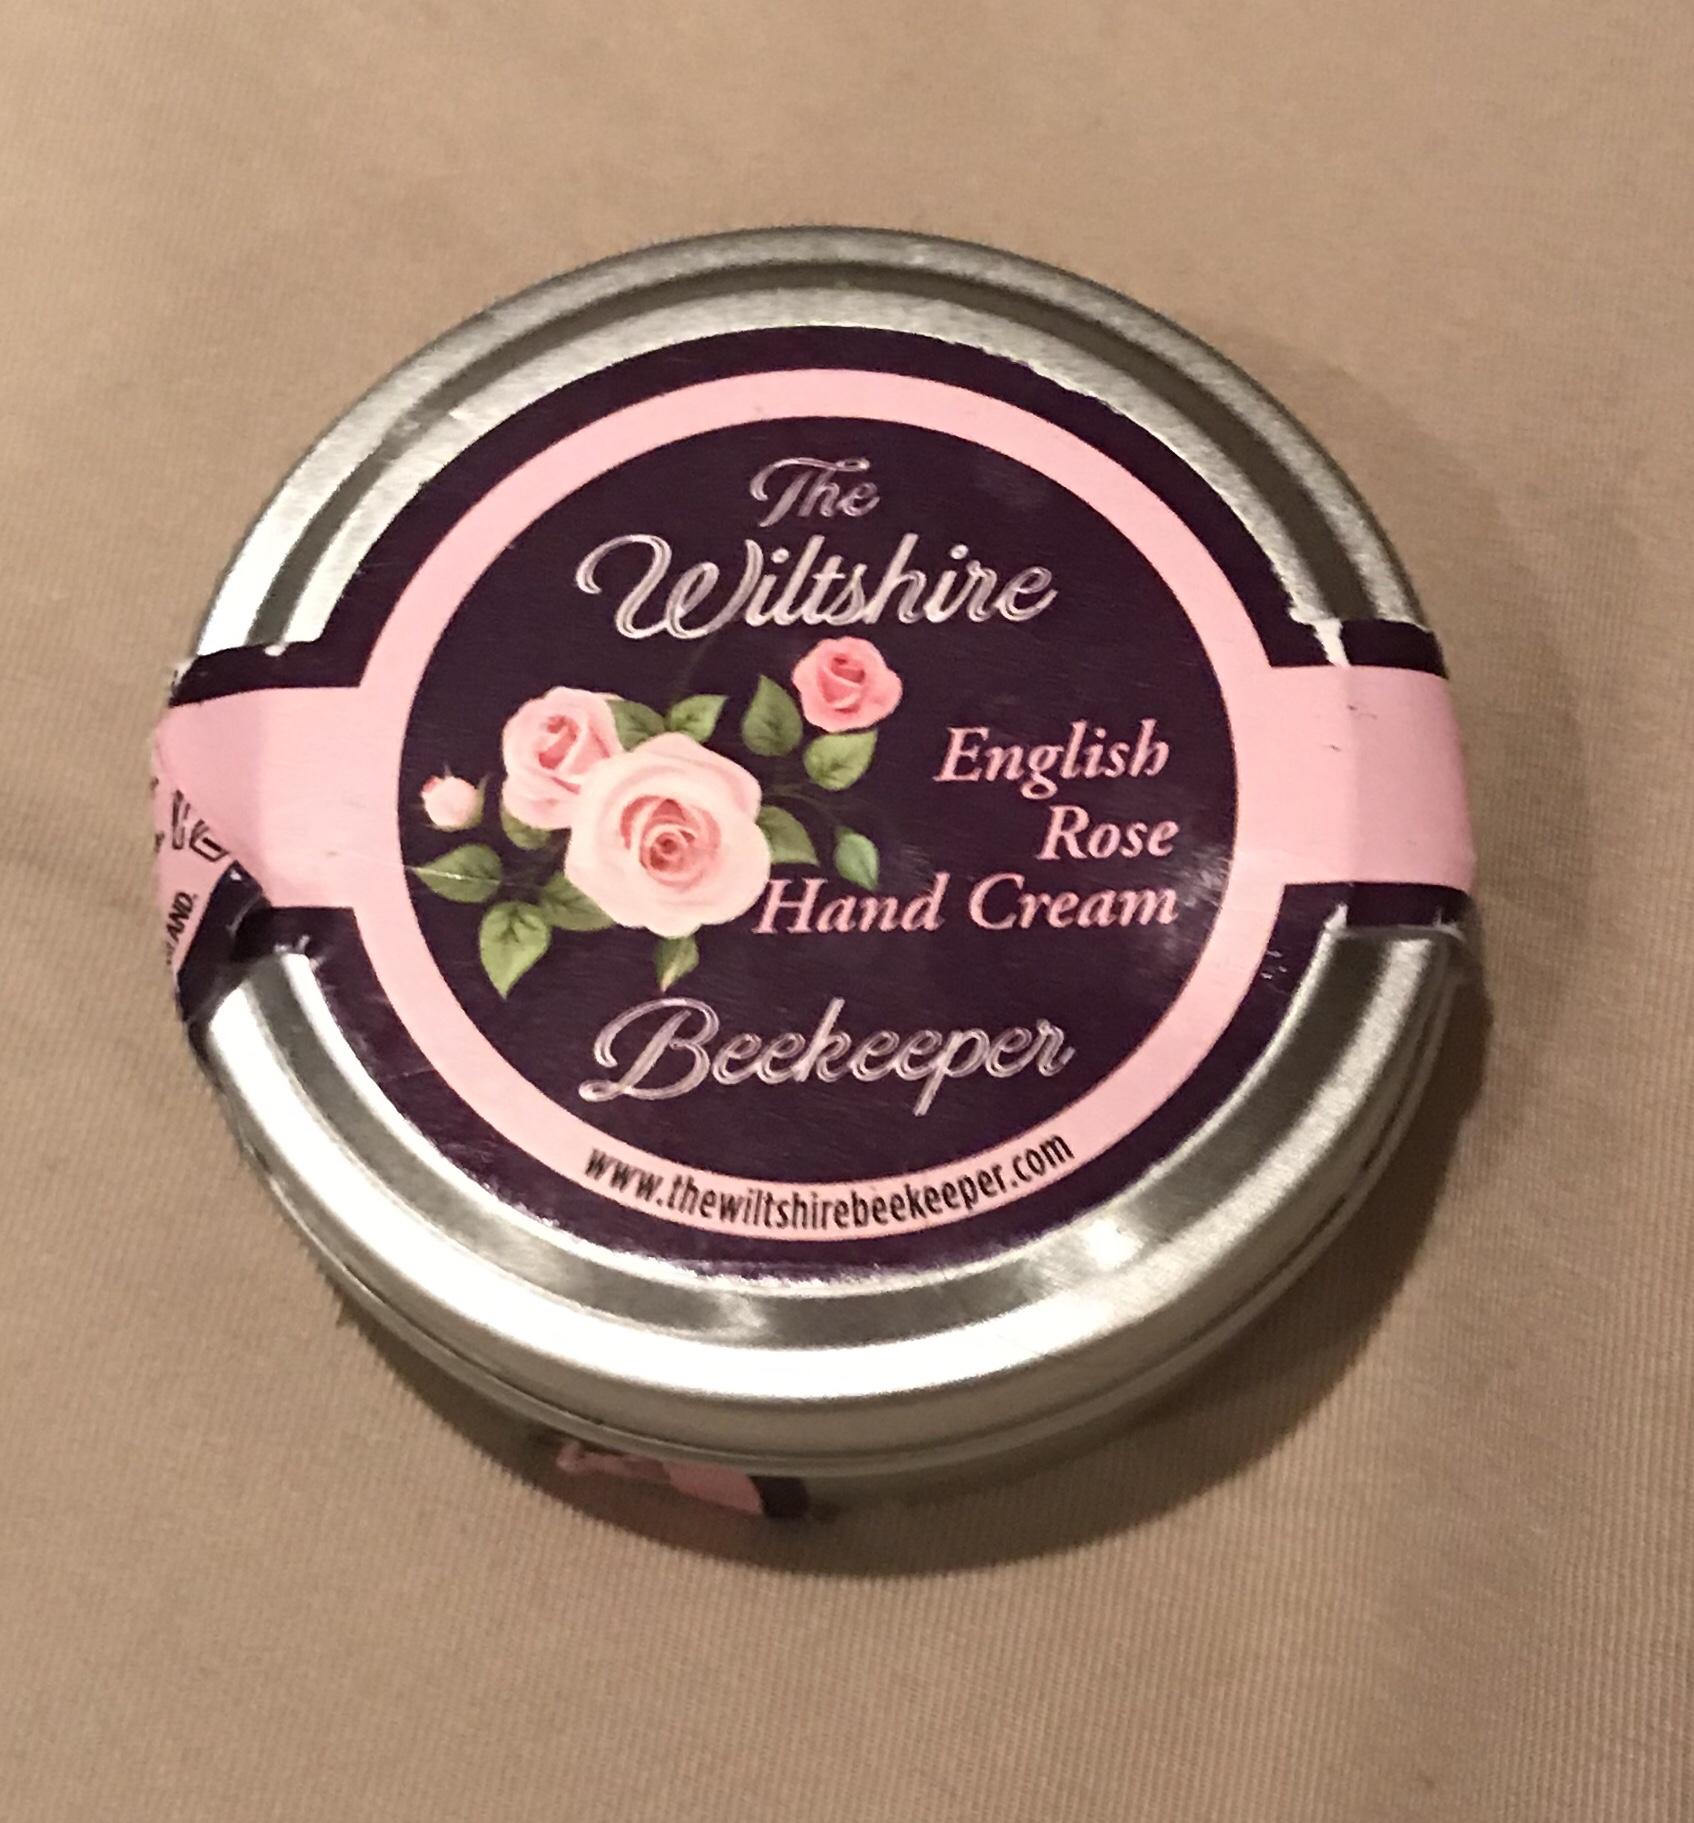 Wiltshire Beekeeper's English Rose Hand Cream